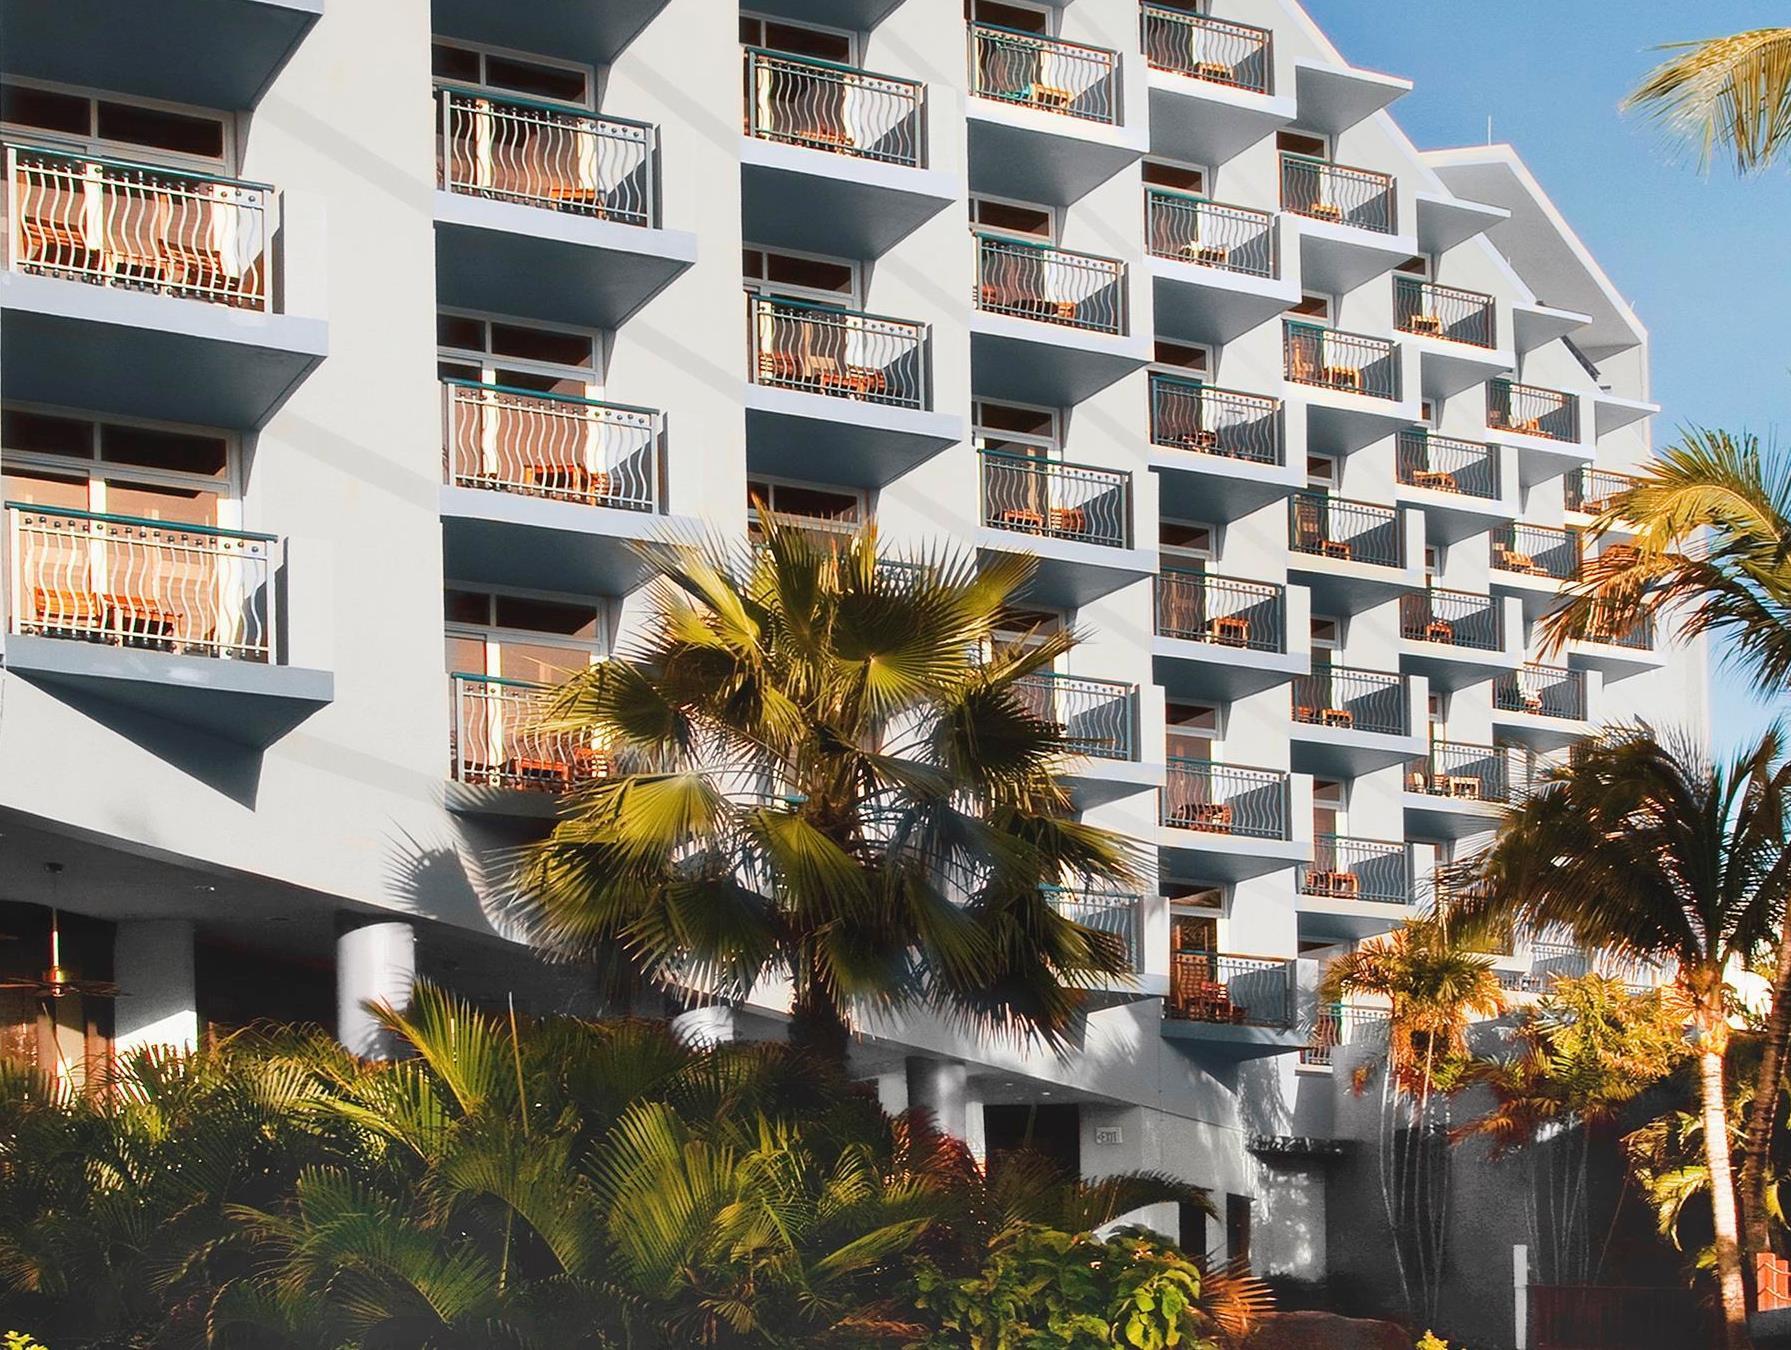 Hilton Aruba Caribbean Resort And Casino